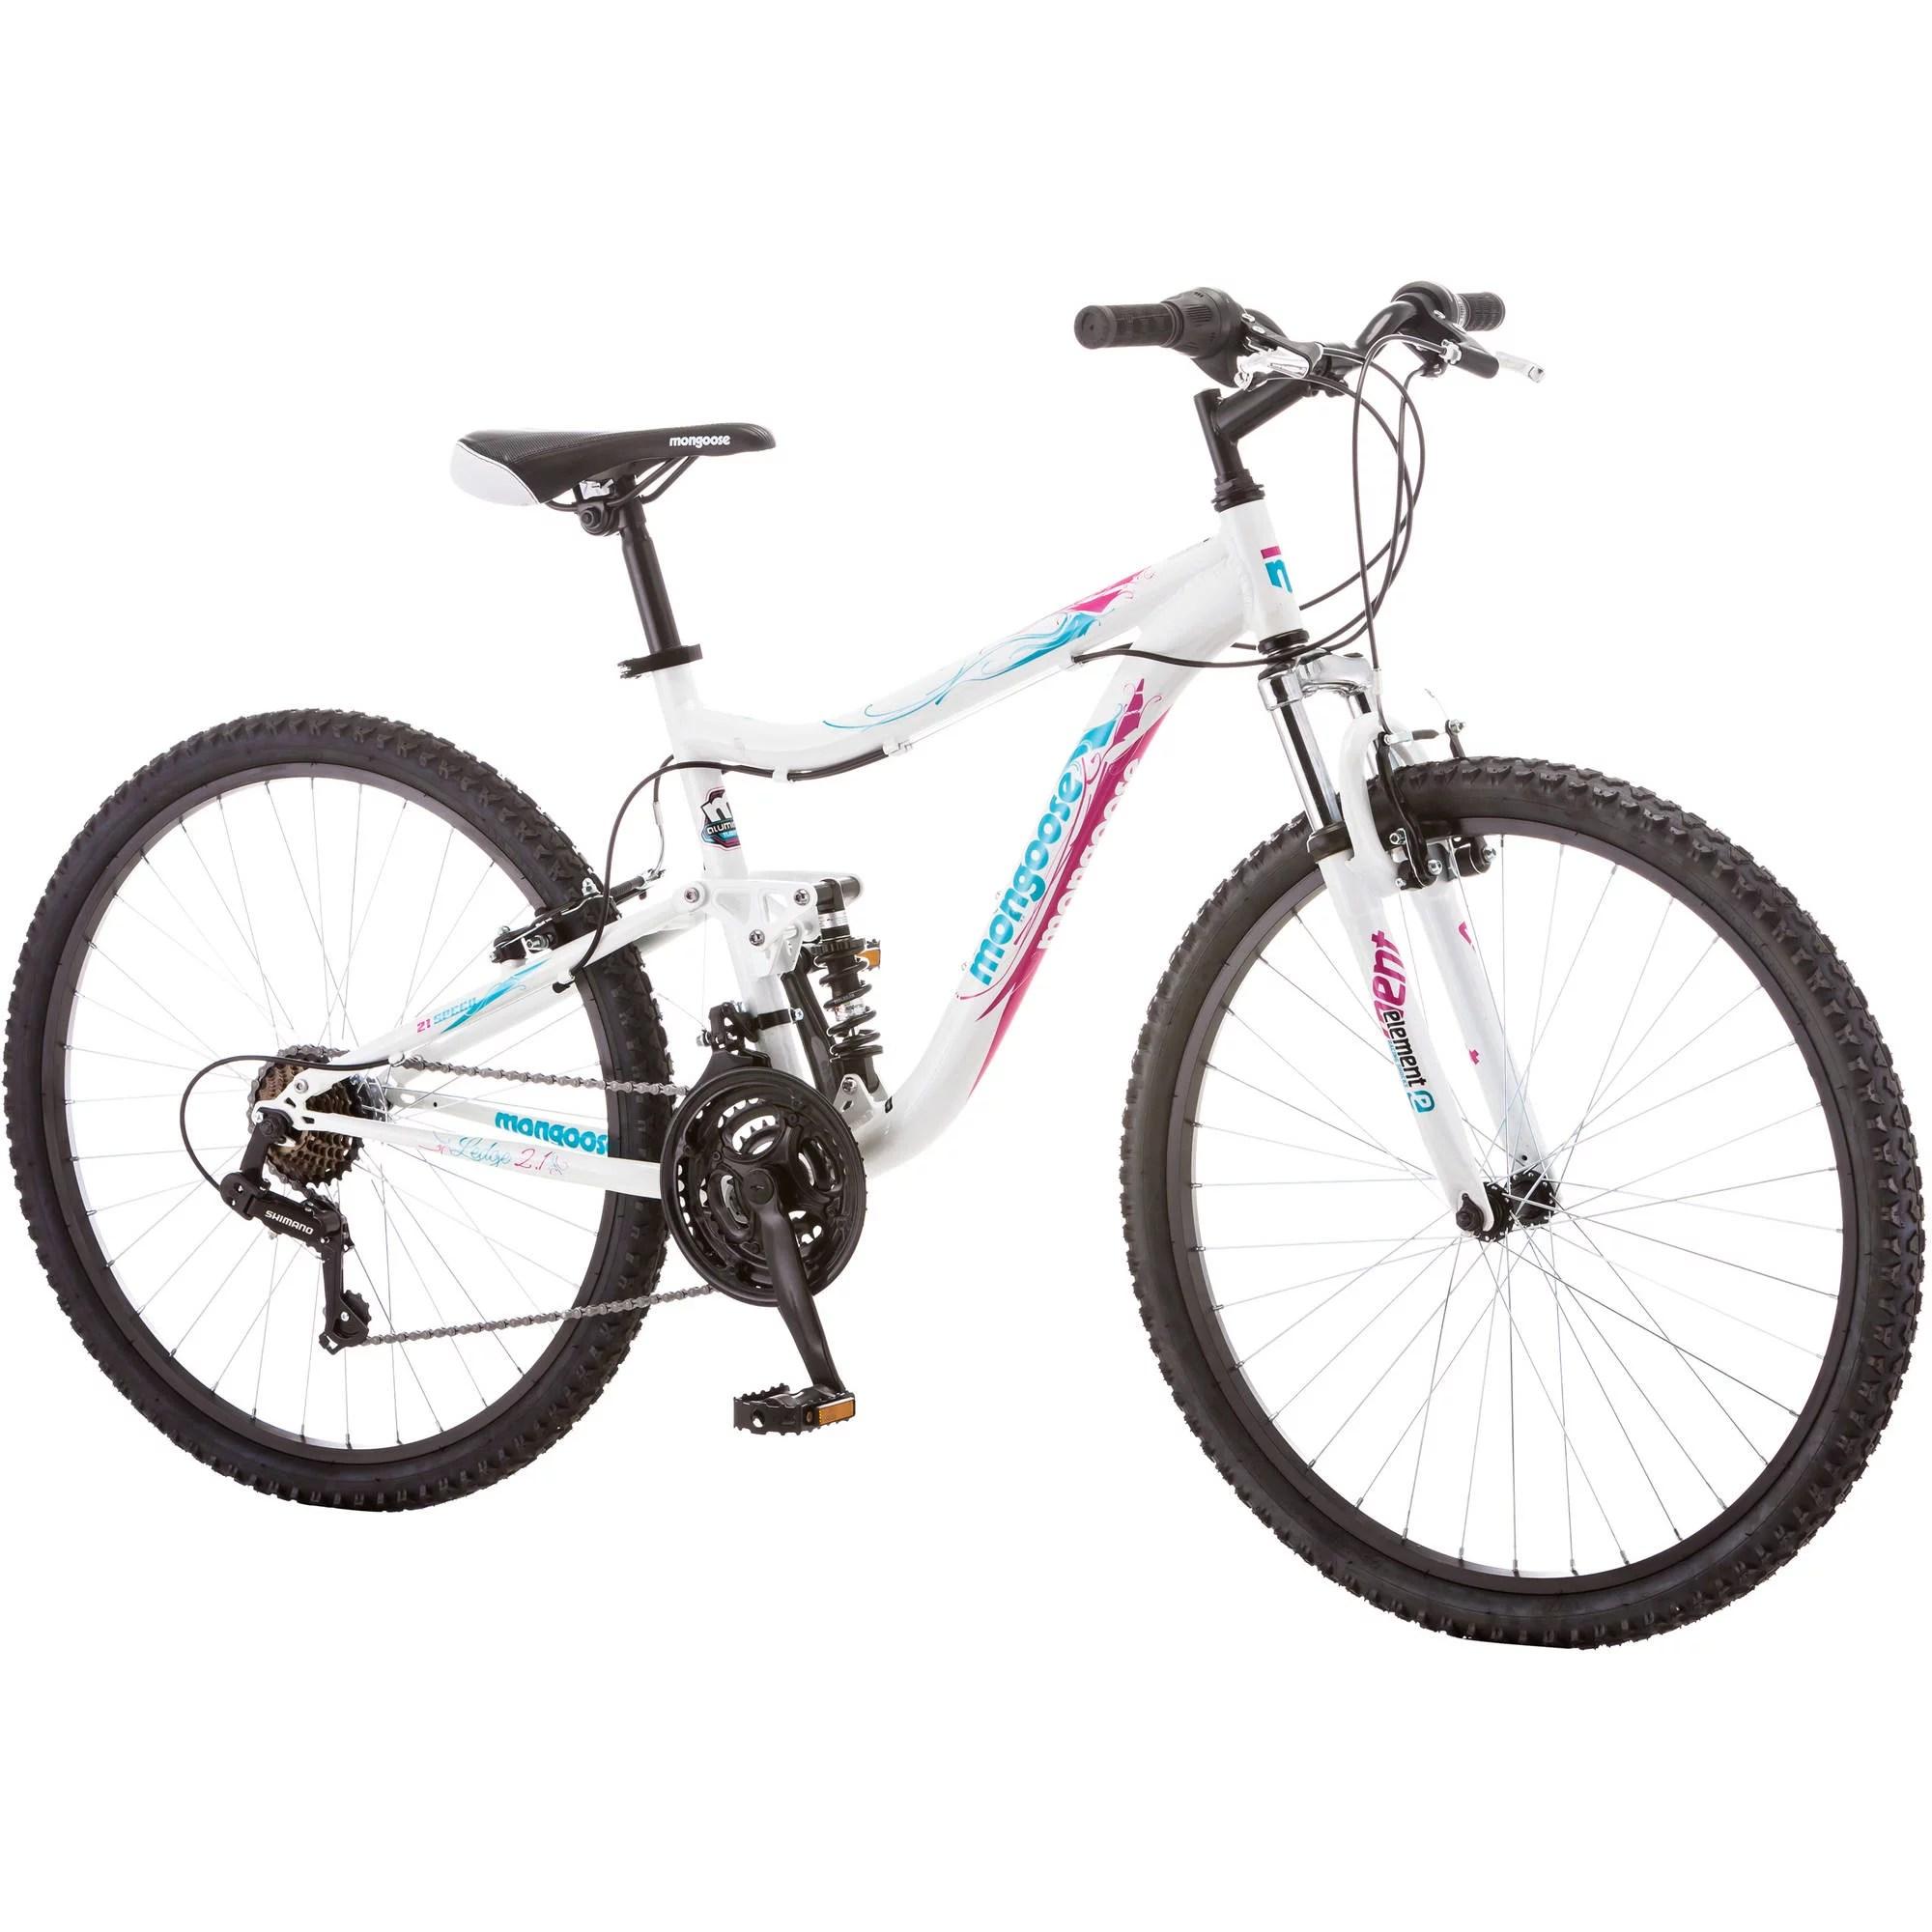 26 Mongoose Ledge 2 1 Women S Mountain Bike White Purple